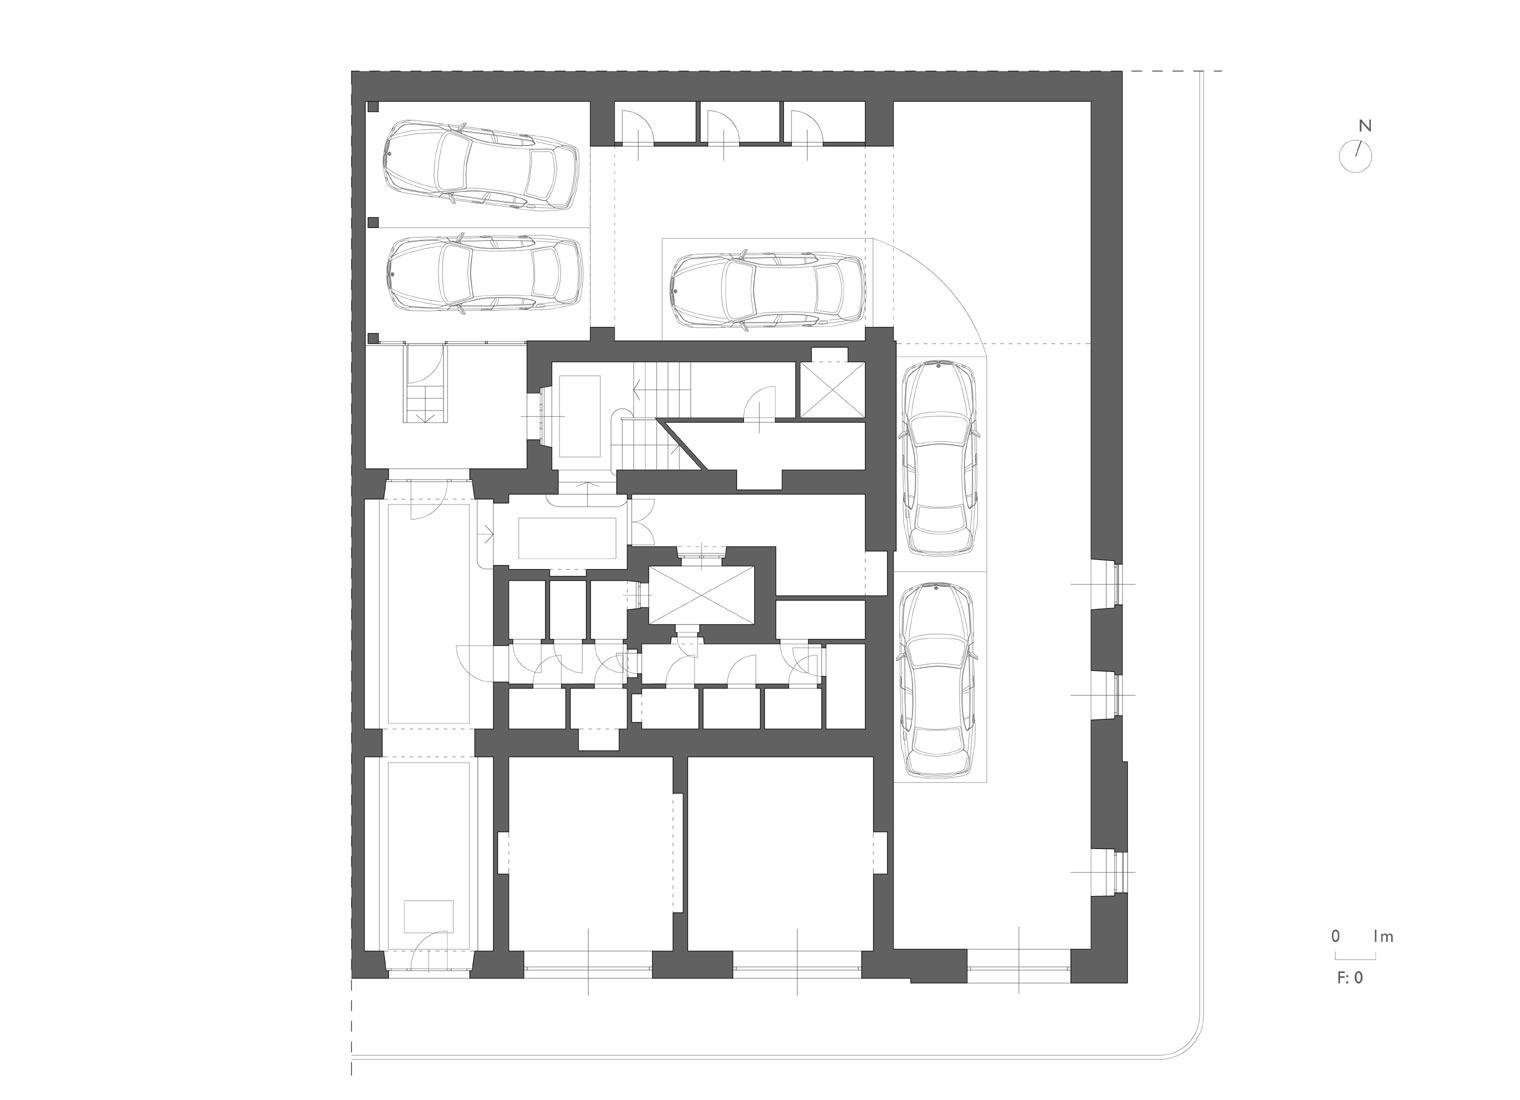 vk-architetti_belvedere_f0